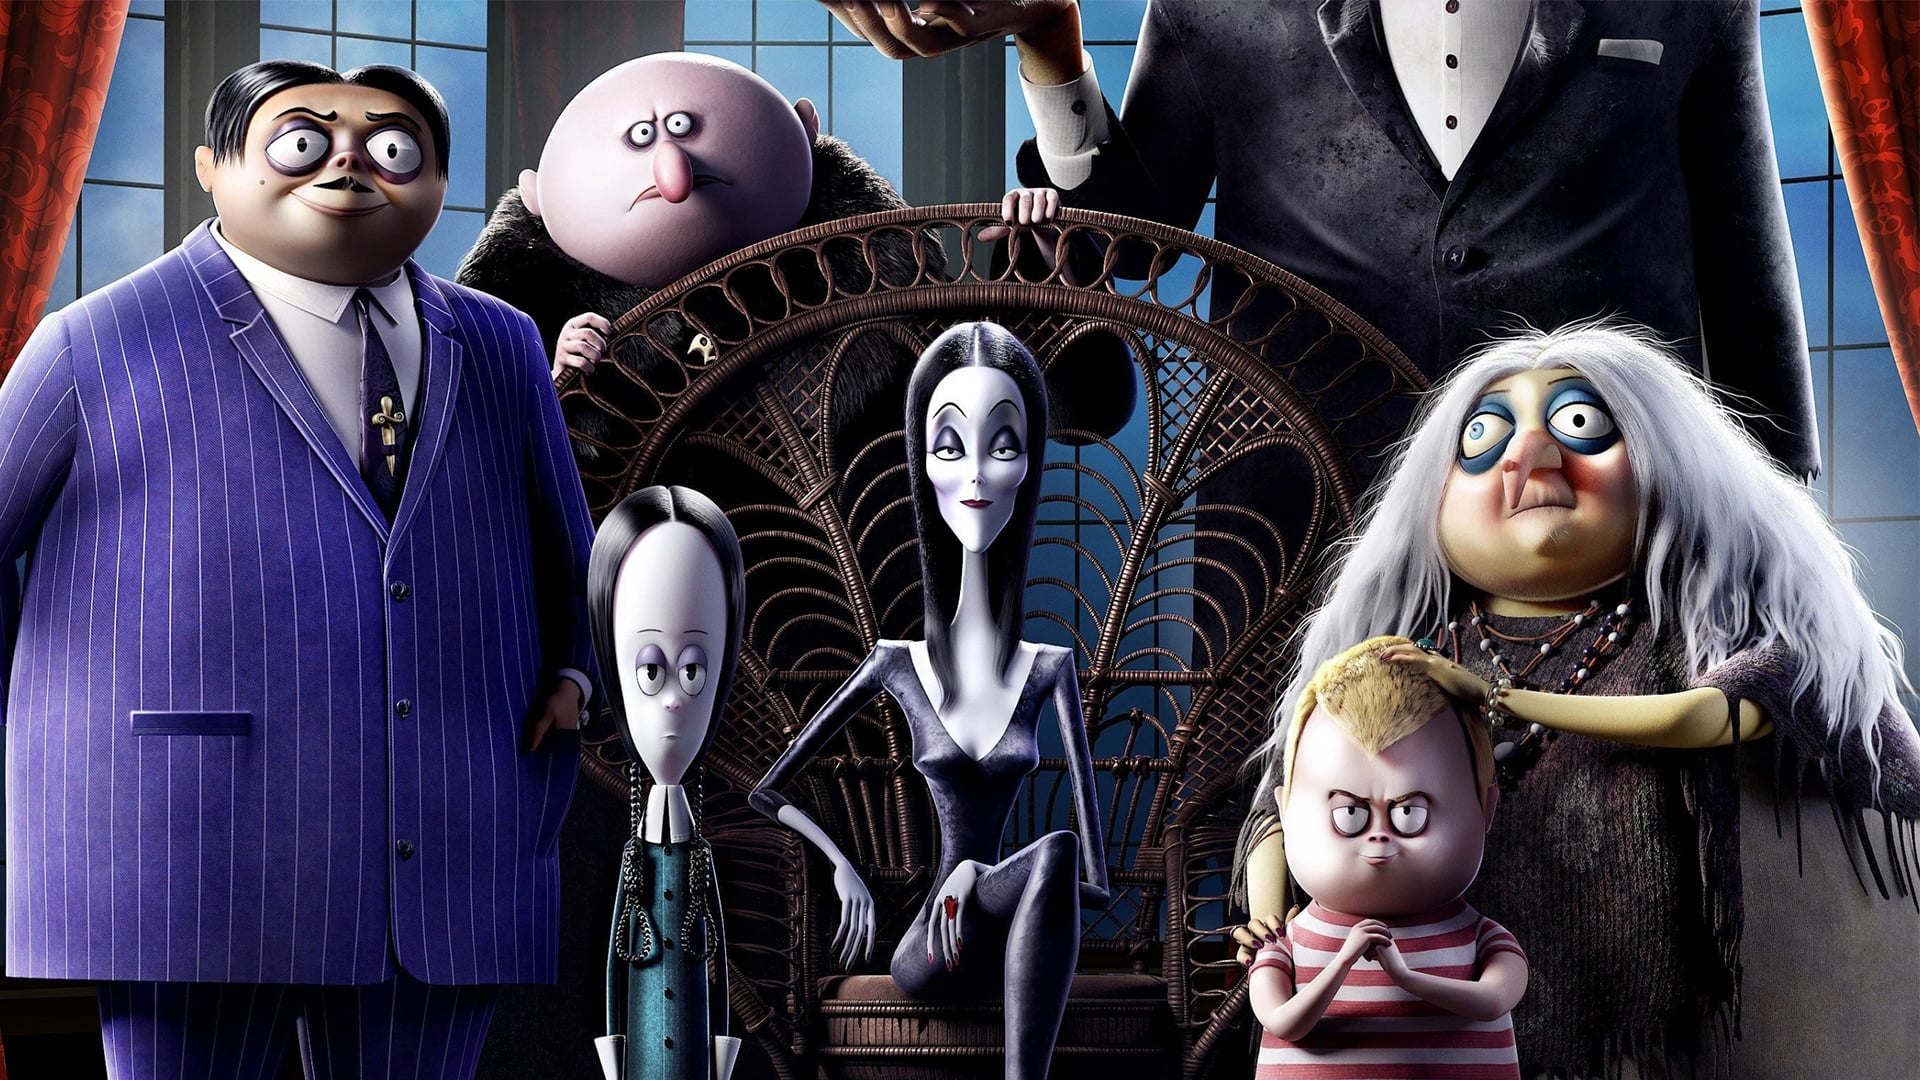 亚当斯一家2 The Addams Family 2 (2021)